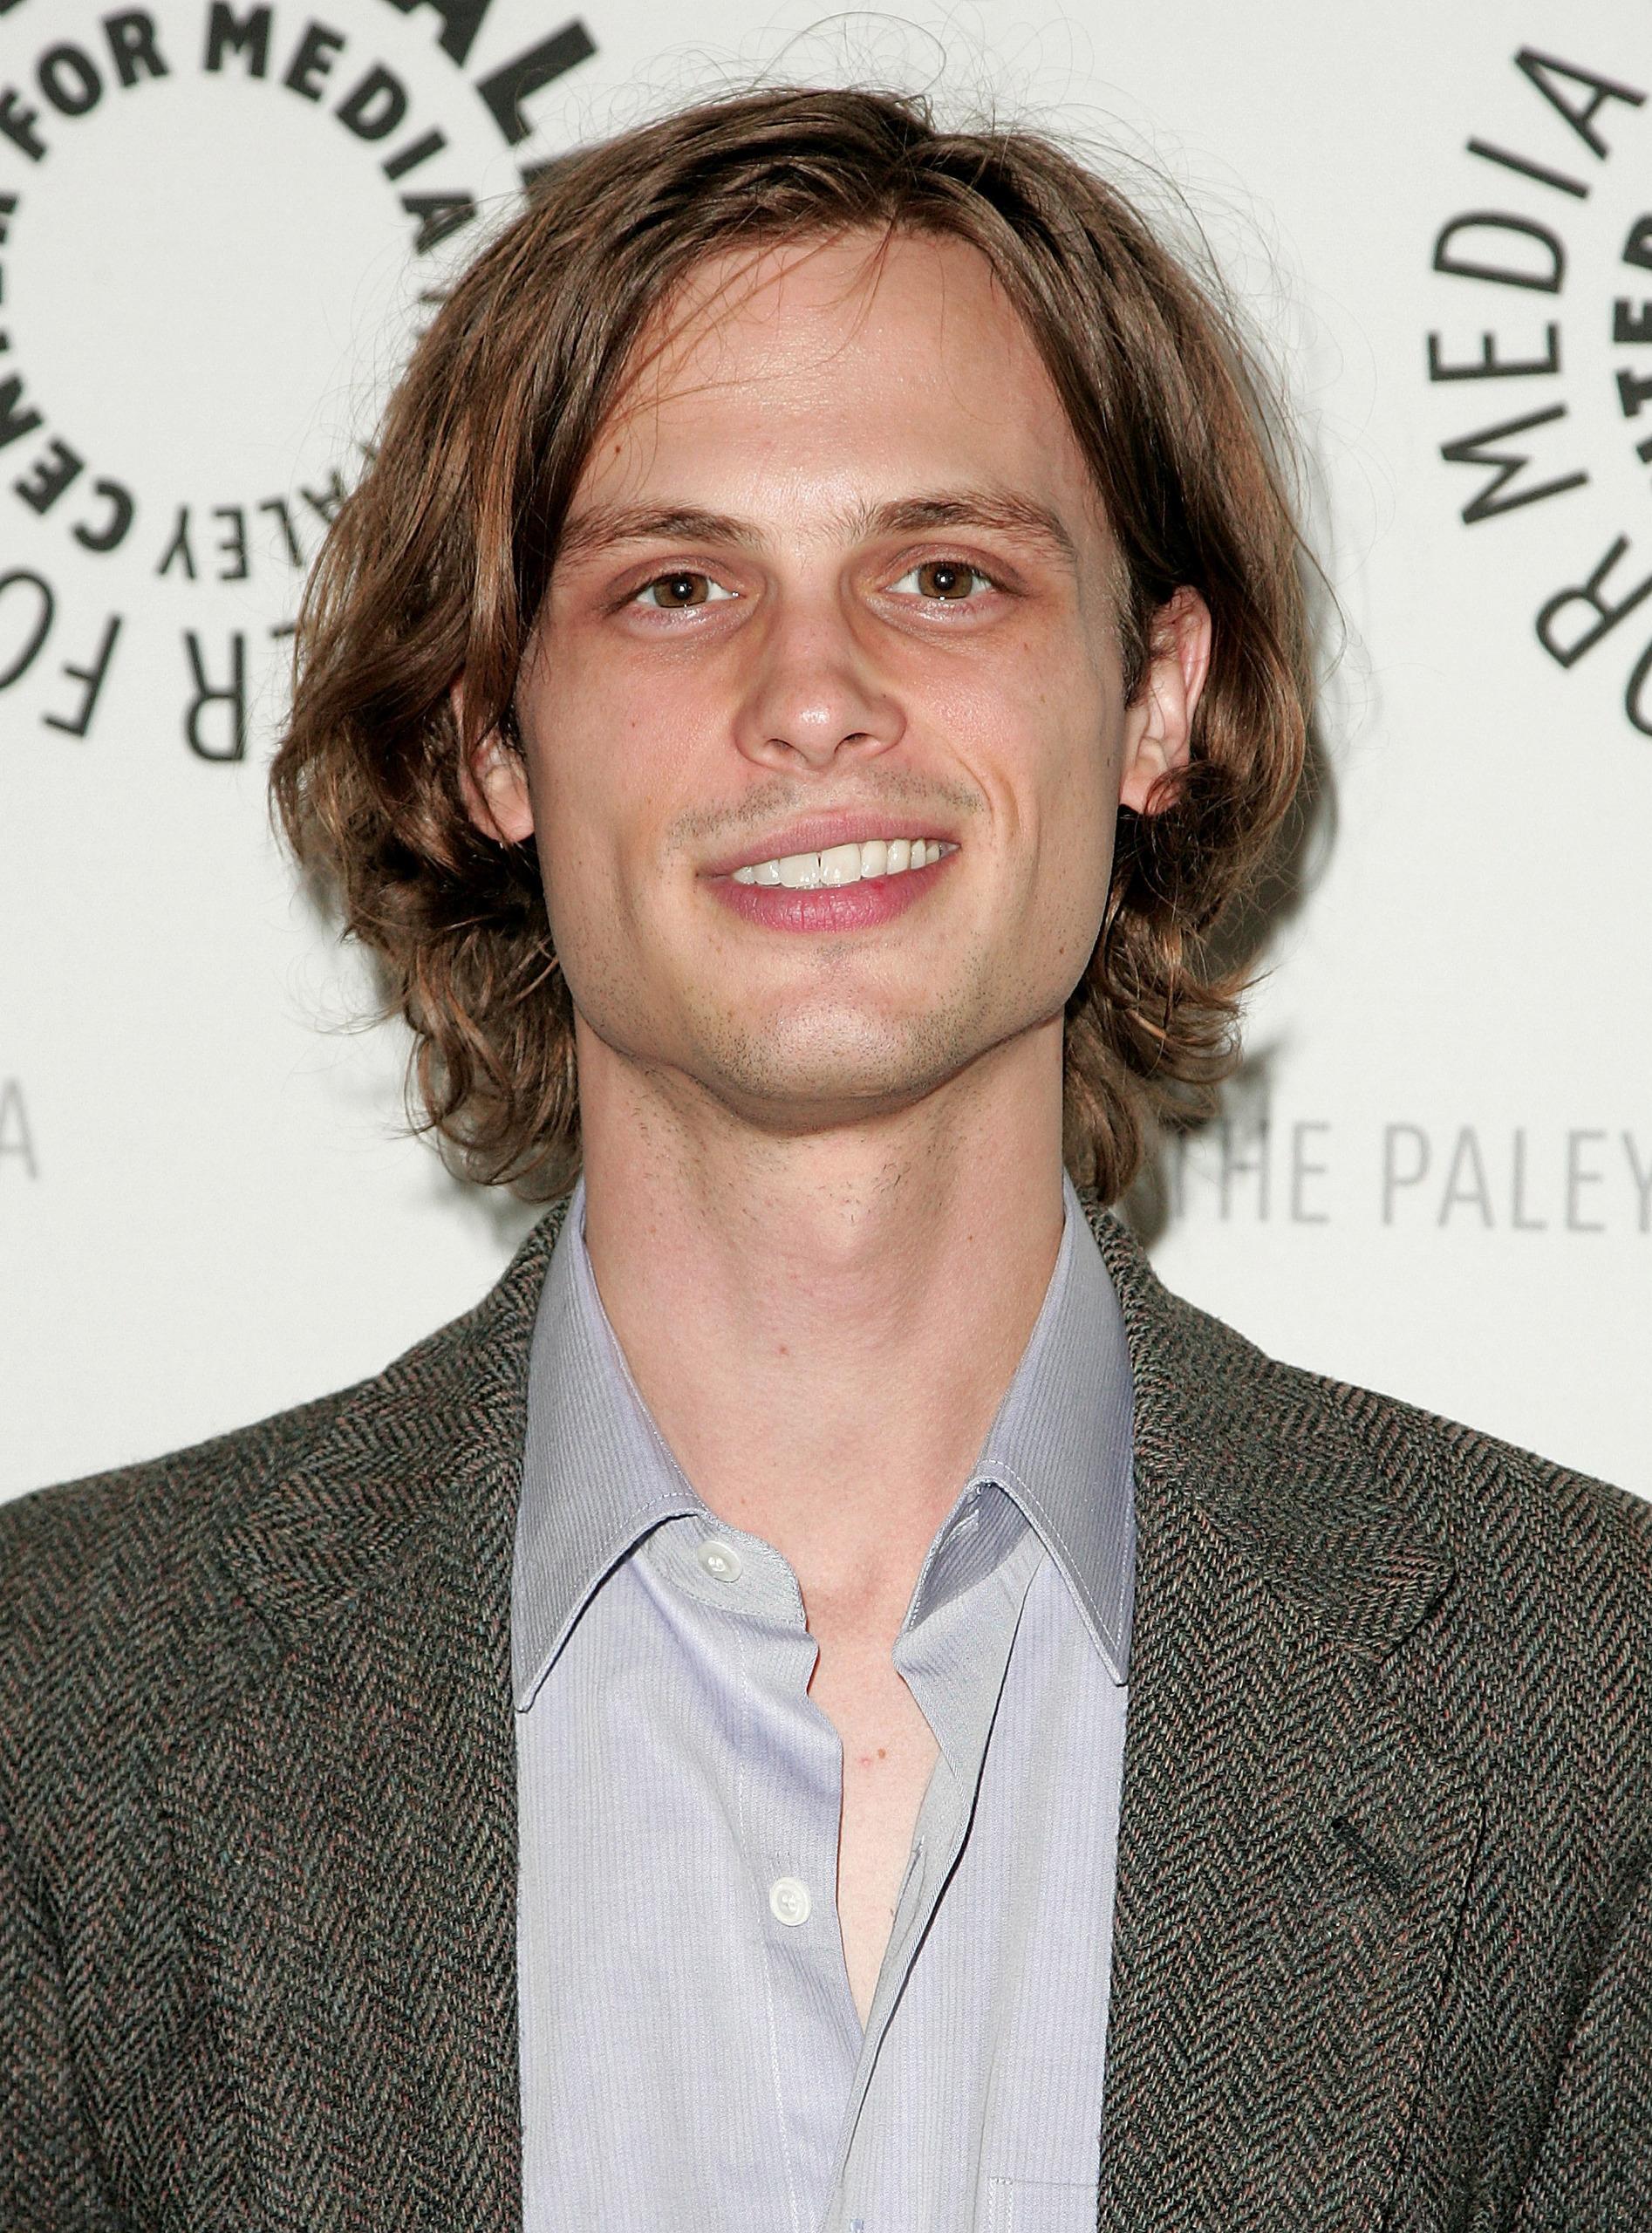 Thomas Gray actor